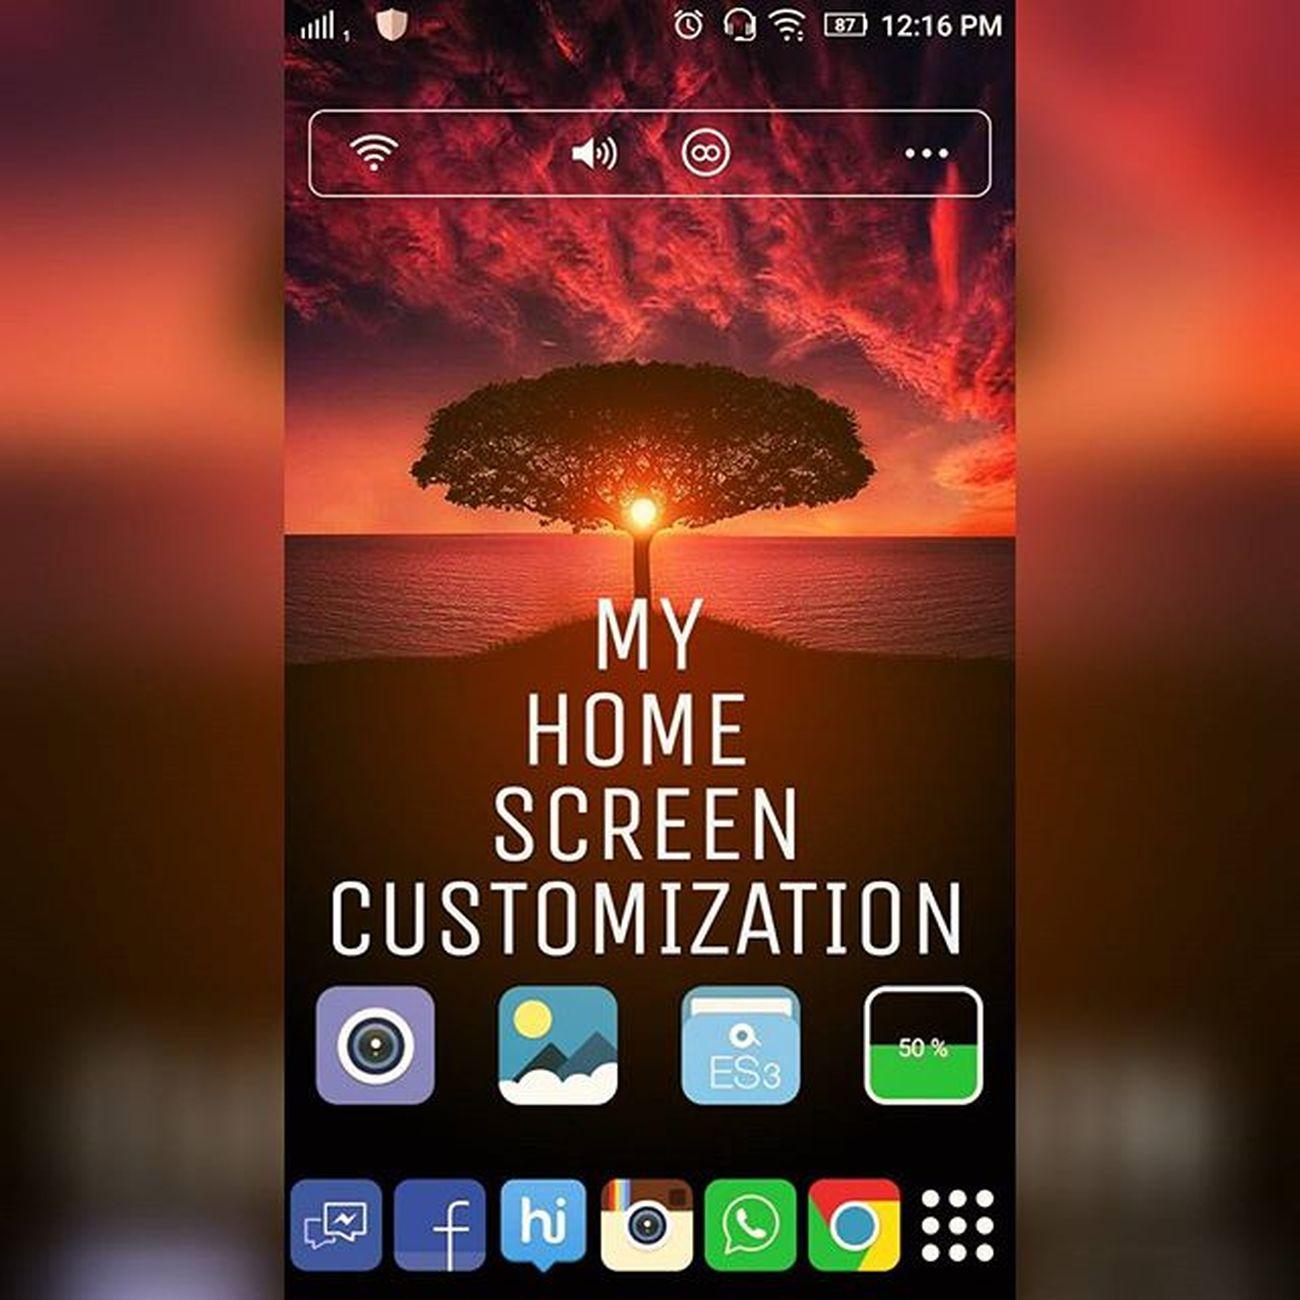 Homescreenchallenge Customization what's ur Customization...??? Lenovo Linelauncher